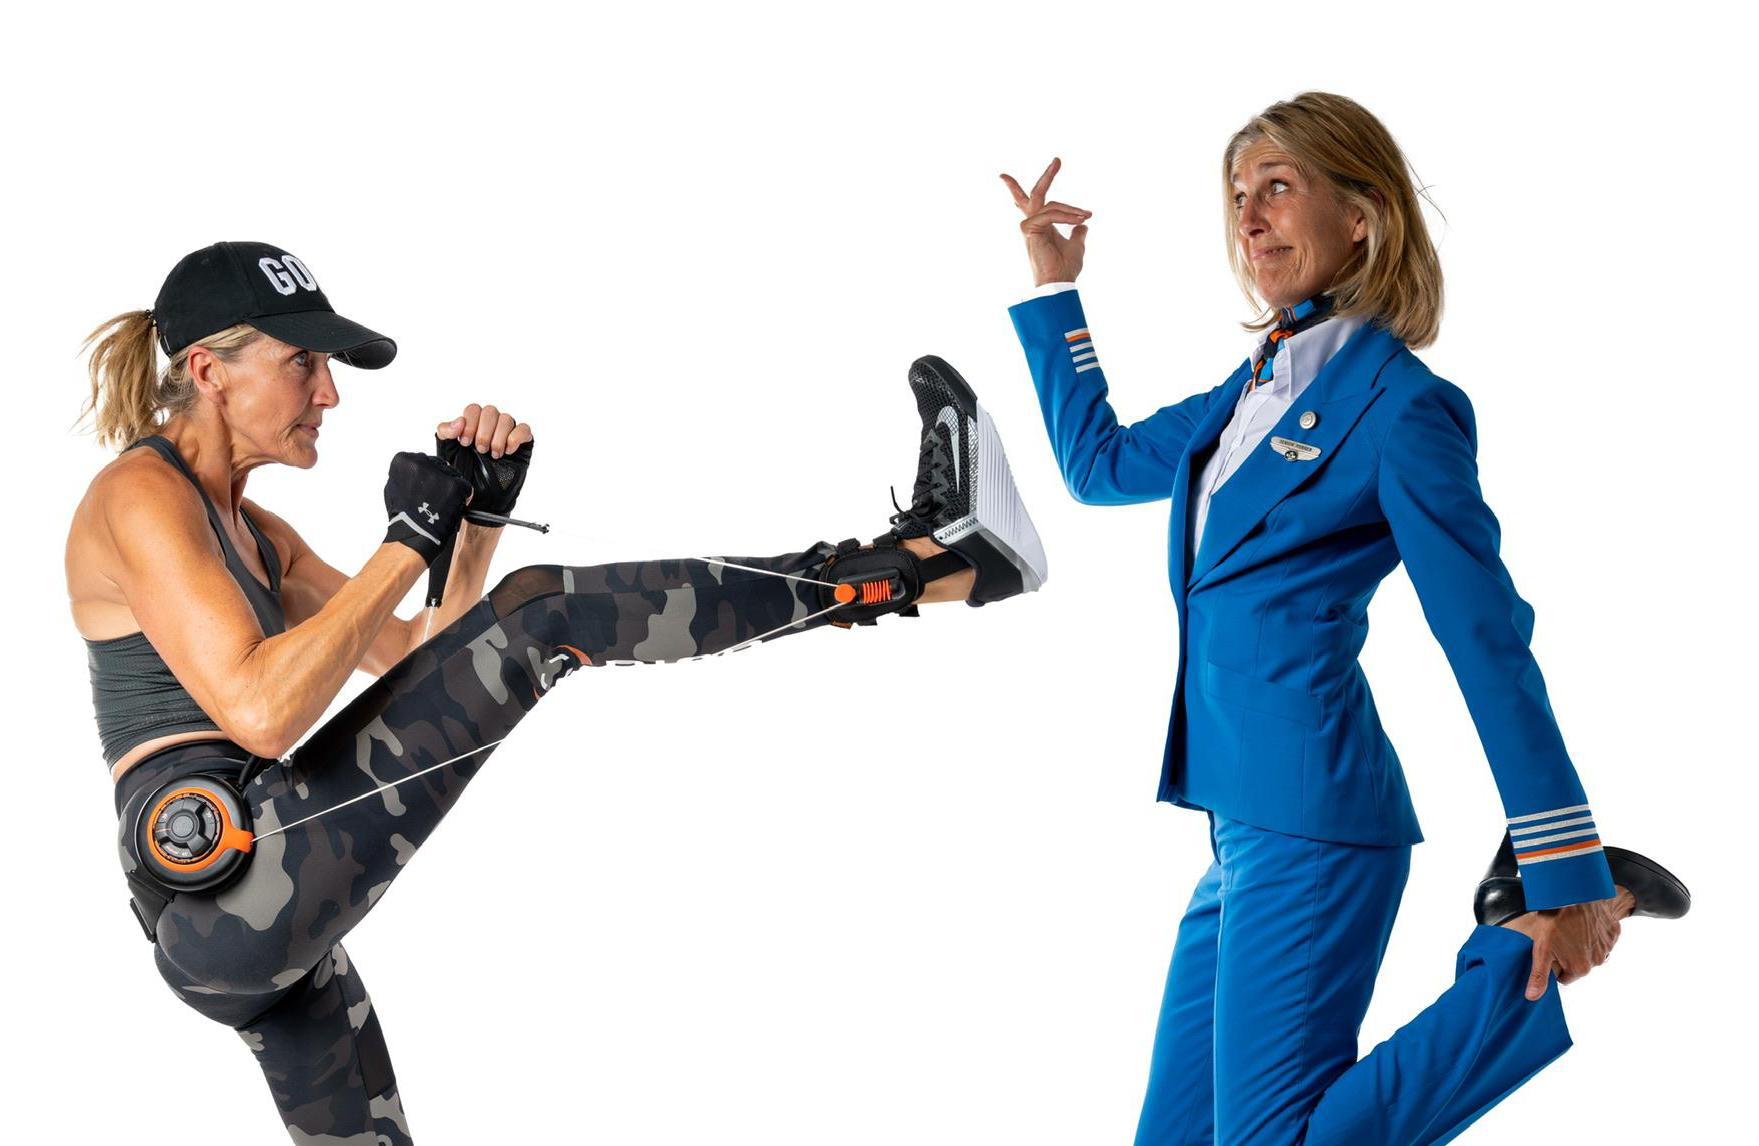 KLM-stewardess fotografeert haar collega's, met de hond, in galajurk en kickboksend